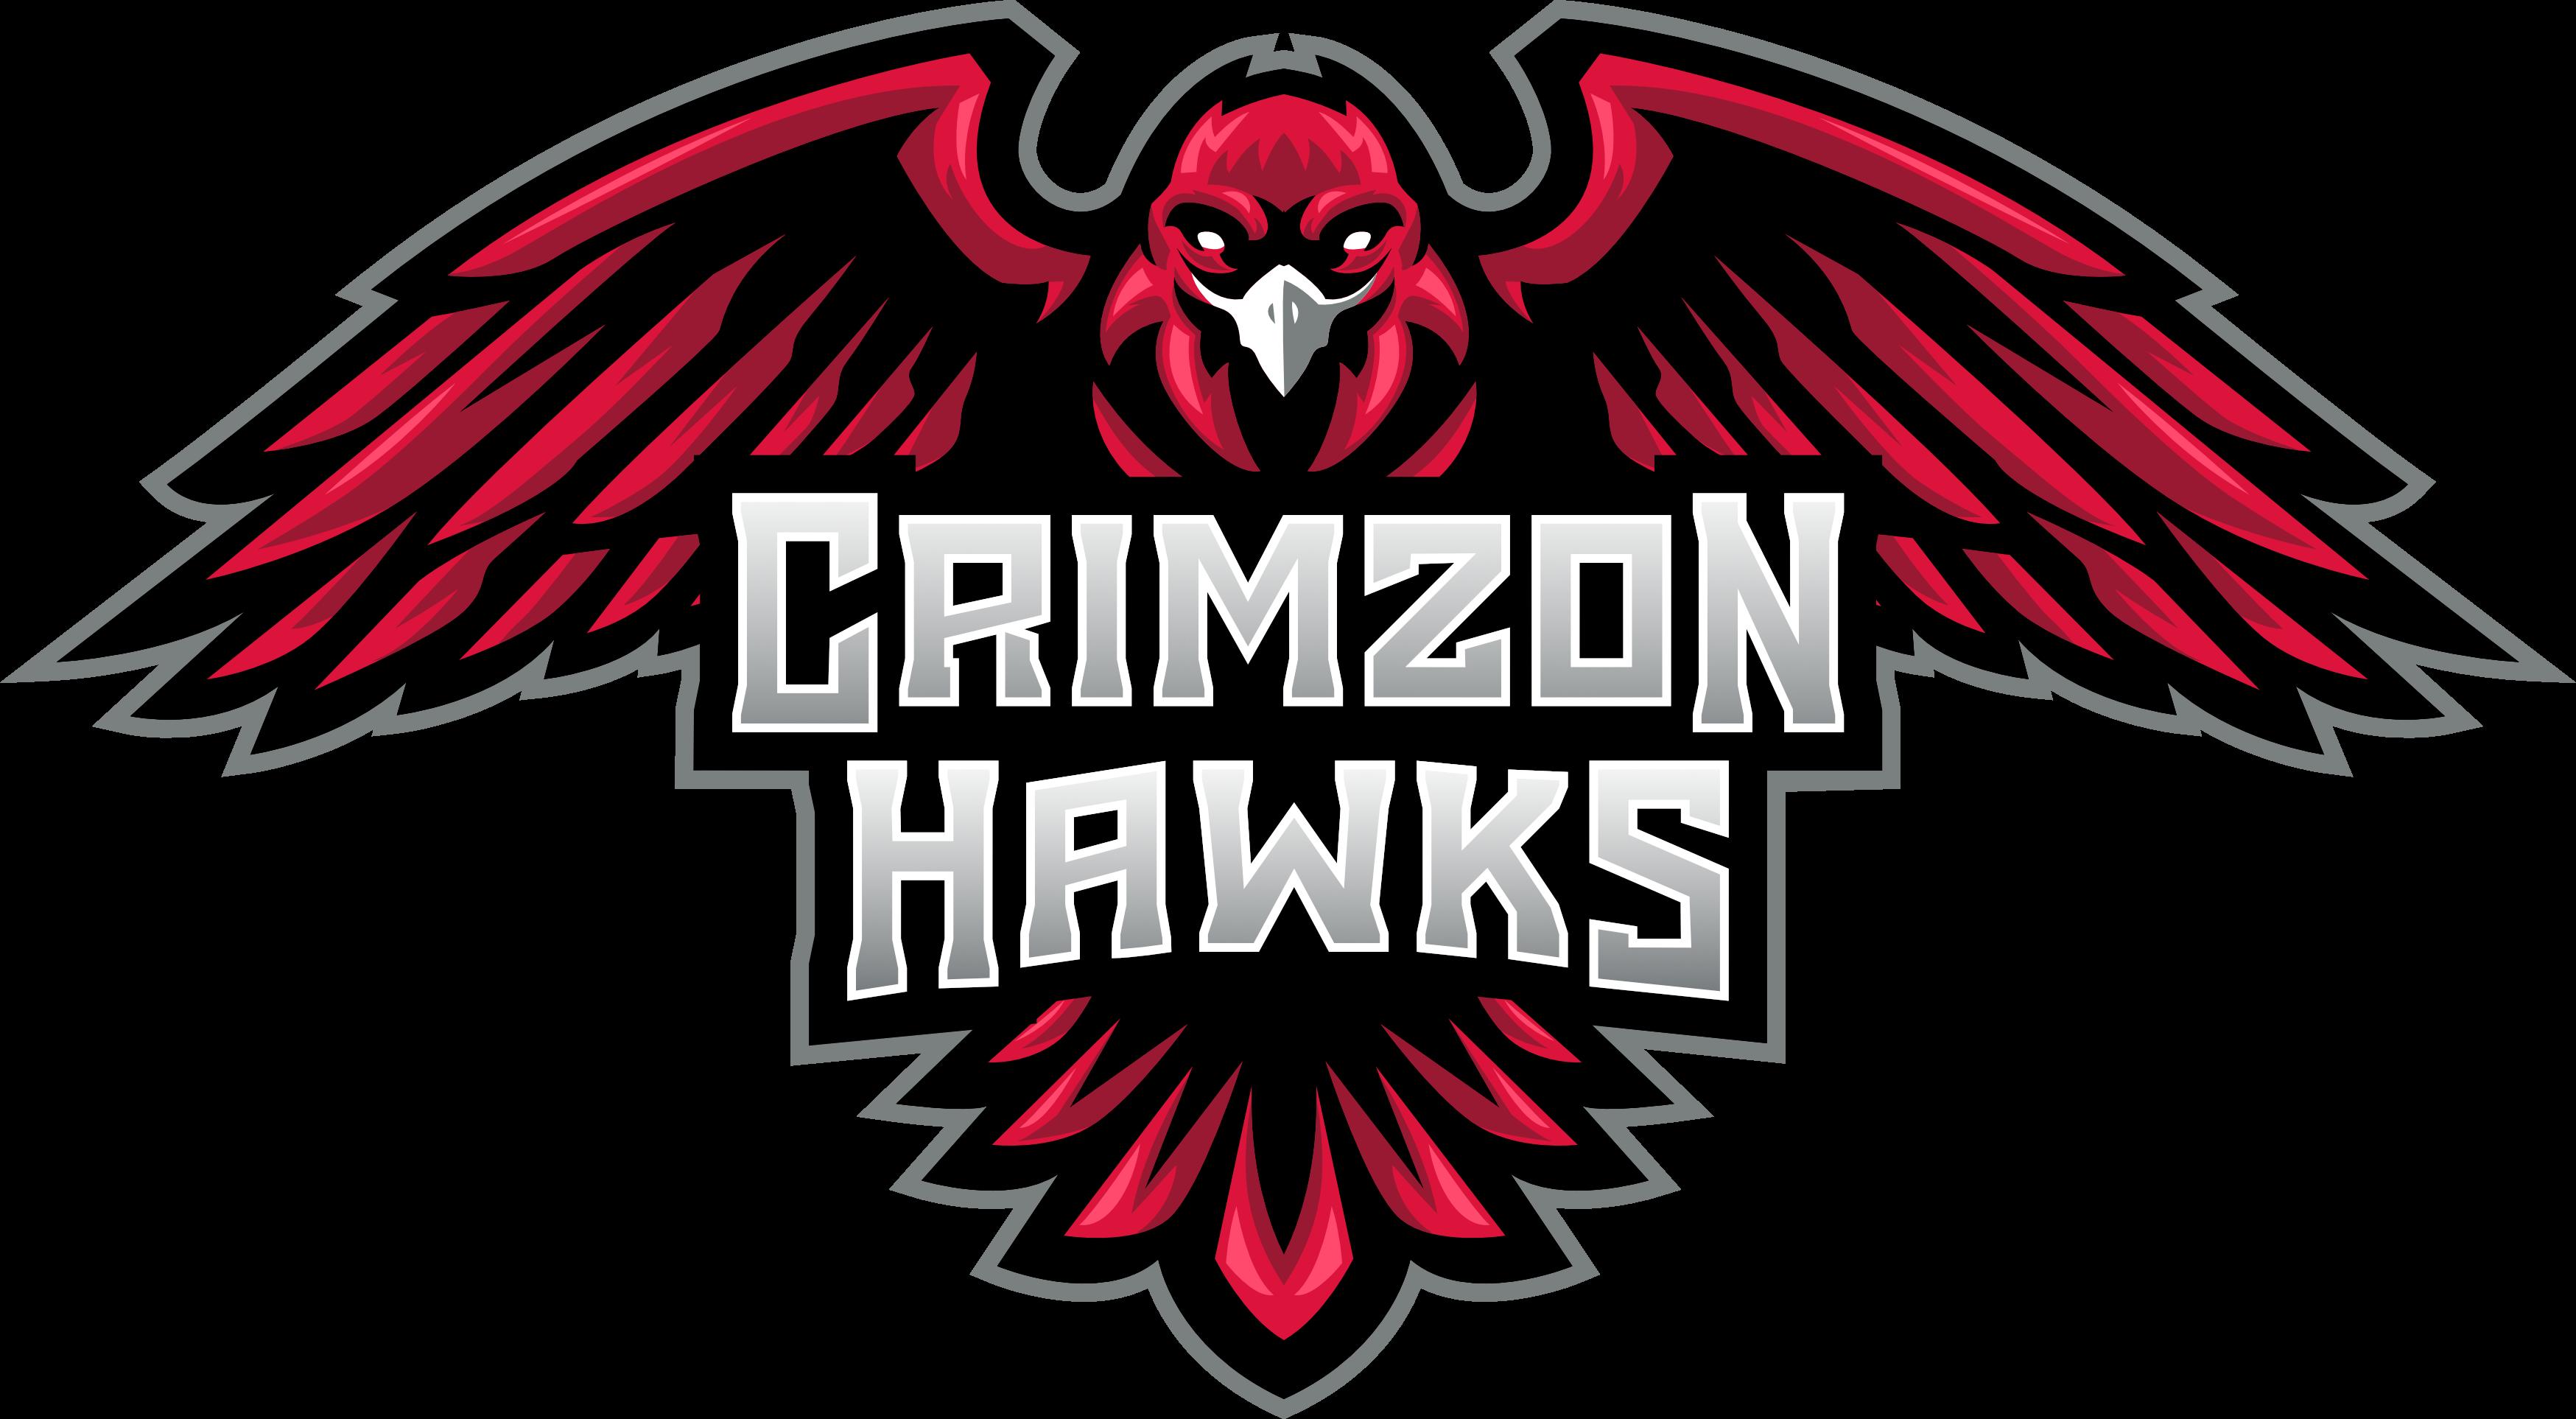 Crimzon Hawks Logo